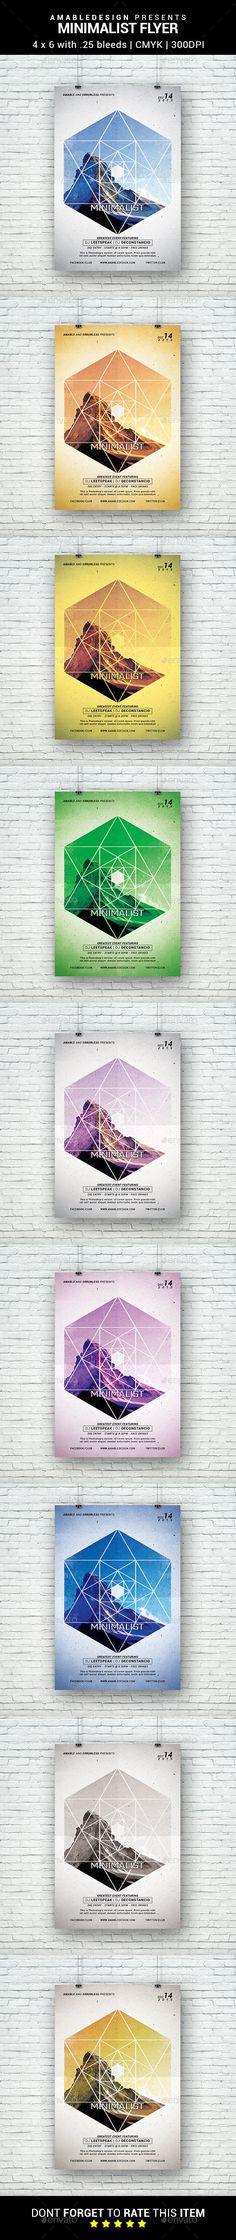 Contemporary Flyer Template 105852 Brochures Pinterest Flyer - contemporary flyer